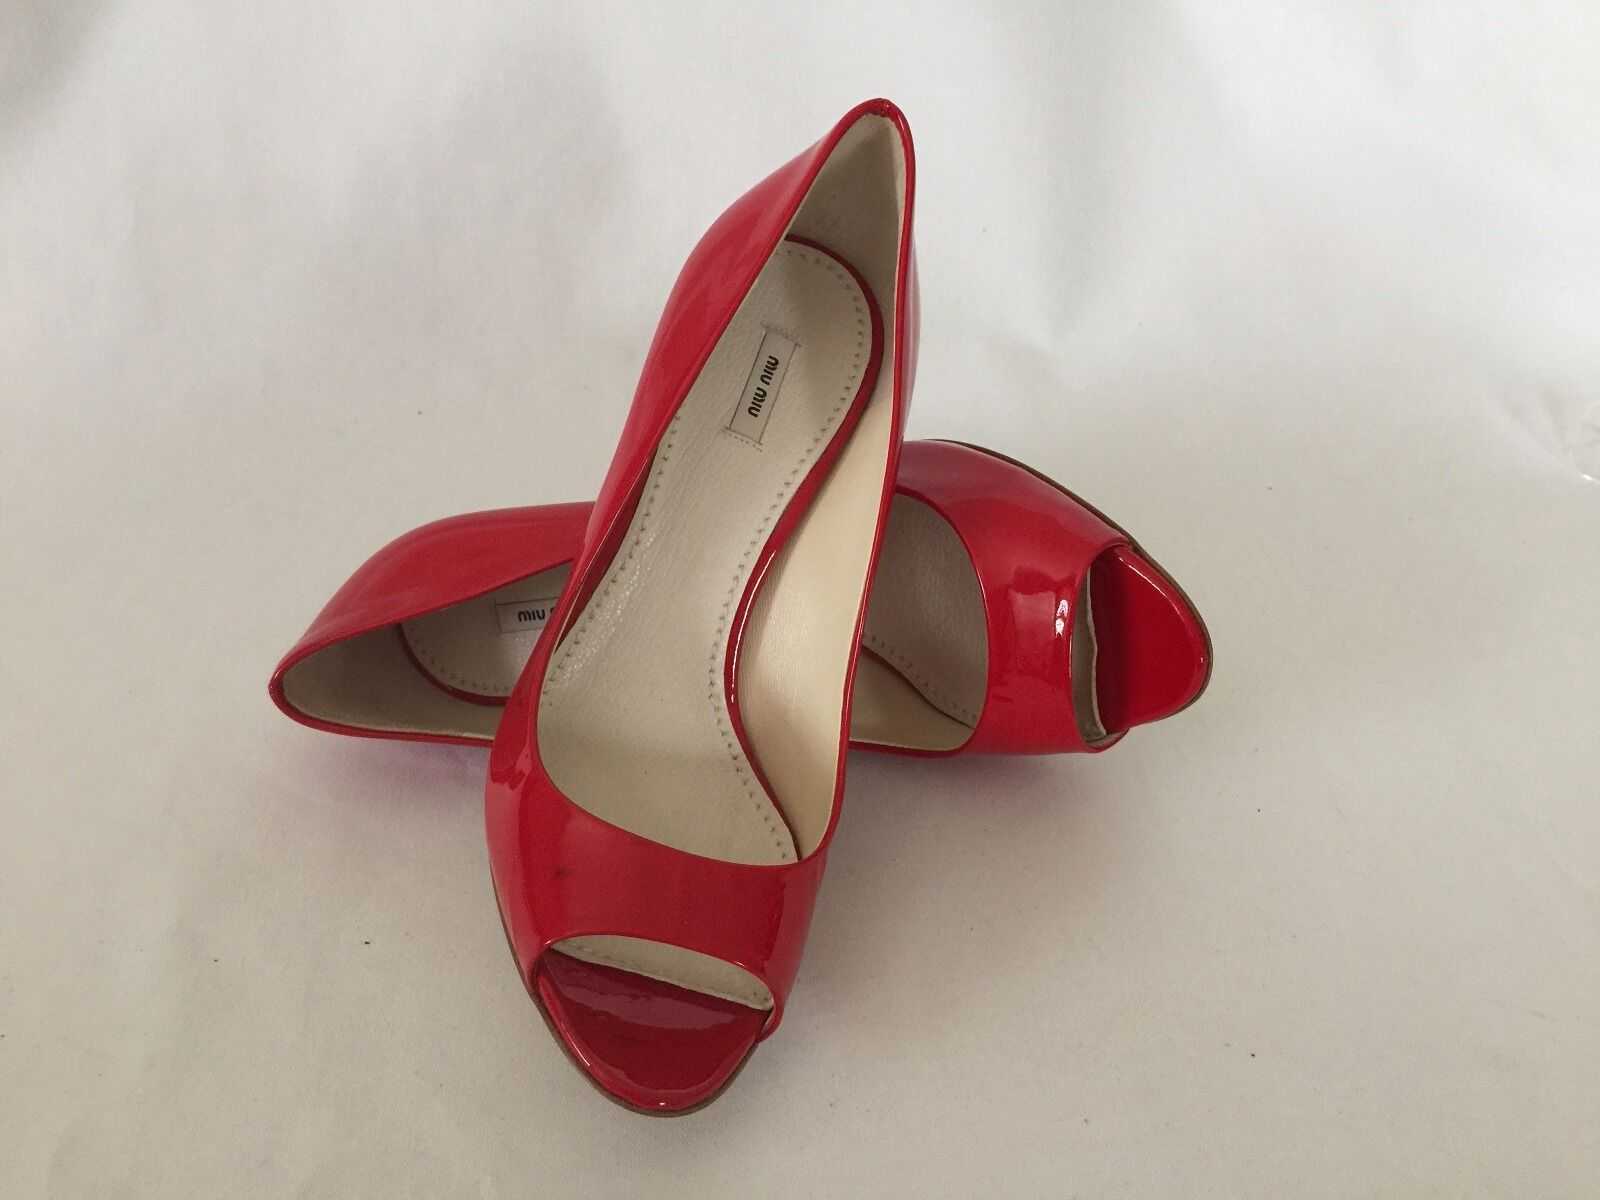 Miu Miu Red Patent Leather Peep Toe Pump Wood Heel Sz 36